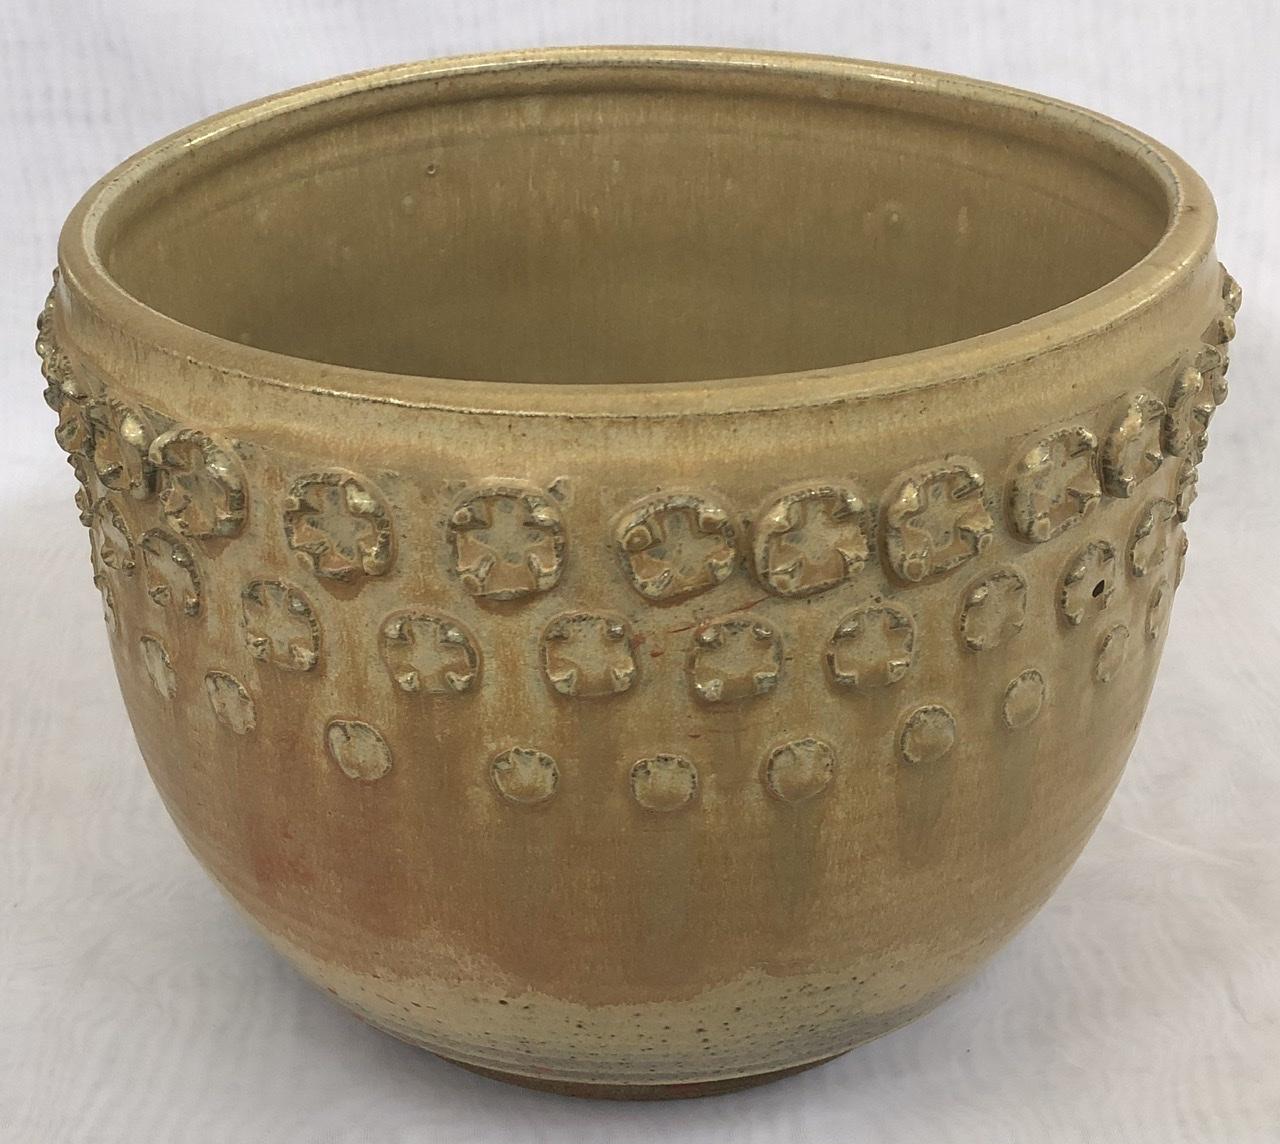 Lindoe bowl